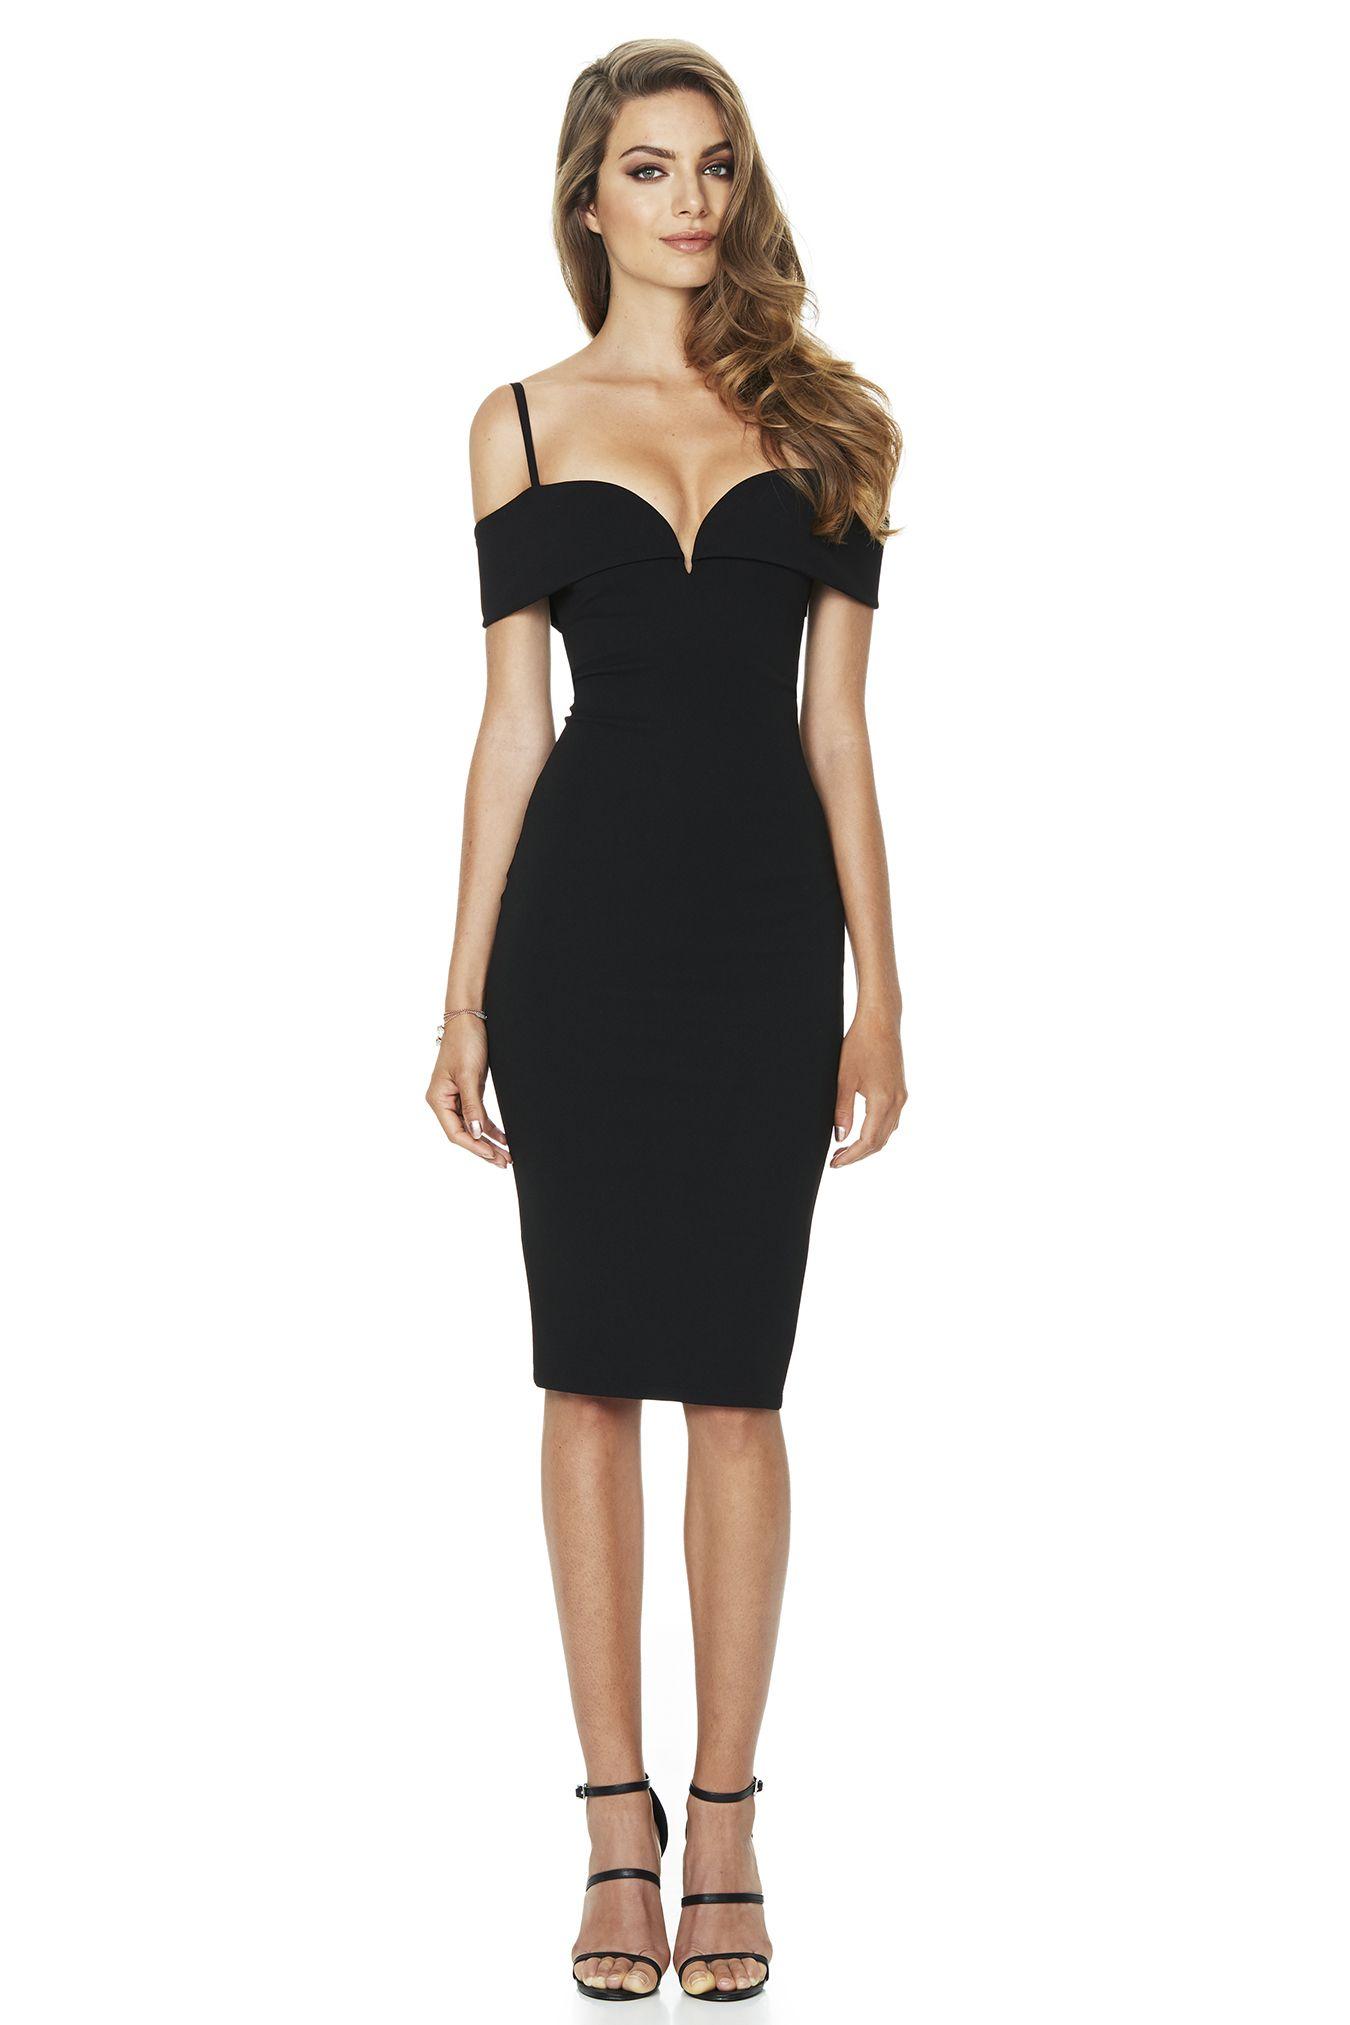 Black dress woman - Nookie Pretty Woman Midi Dress Black